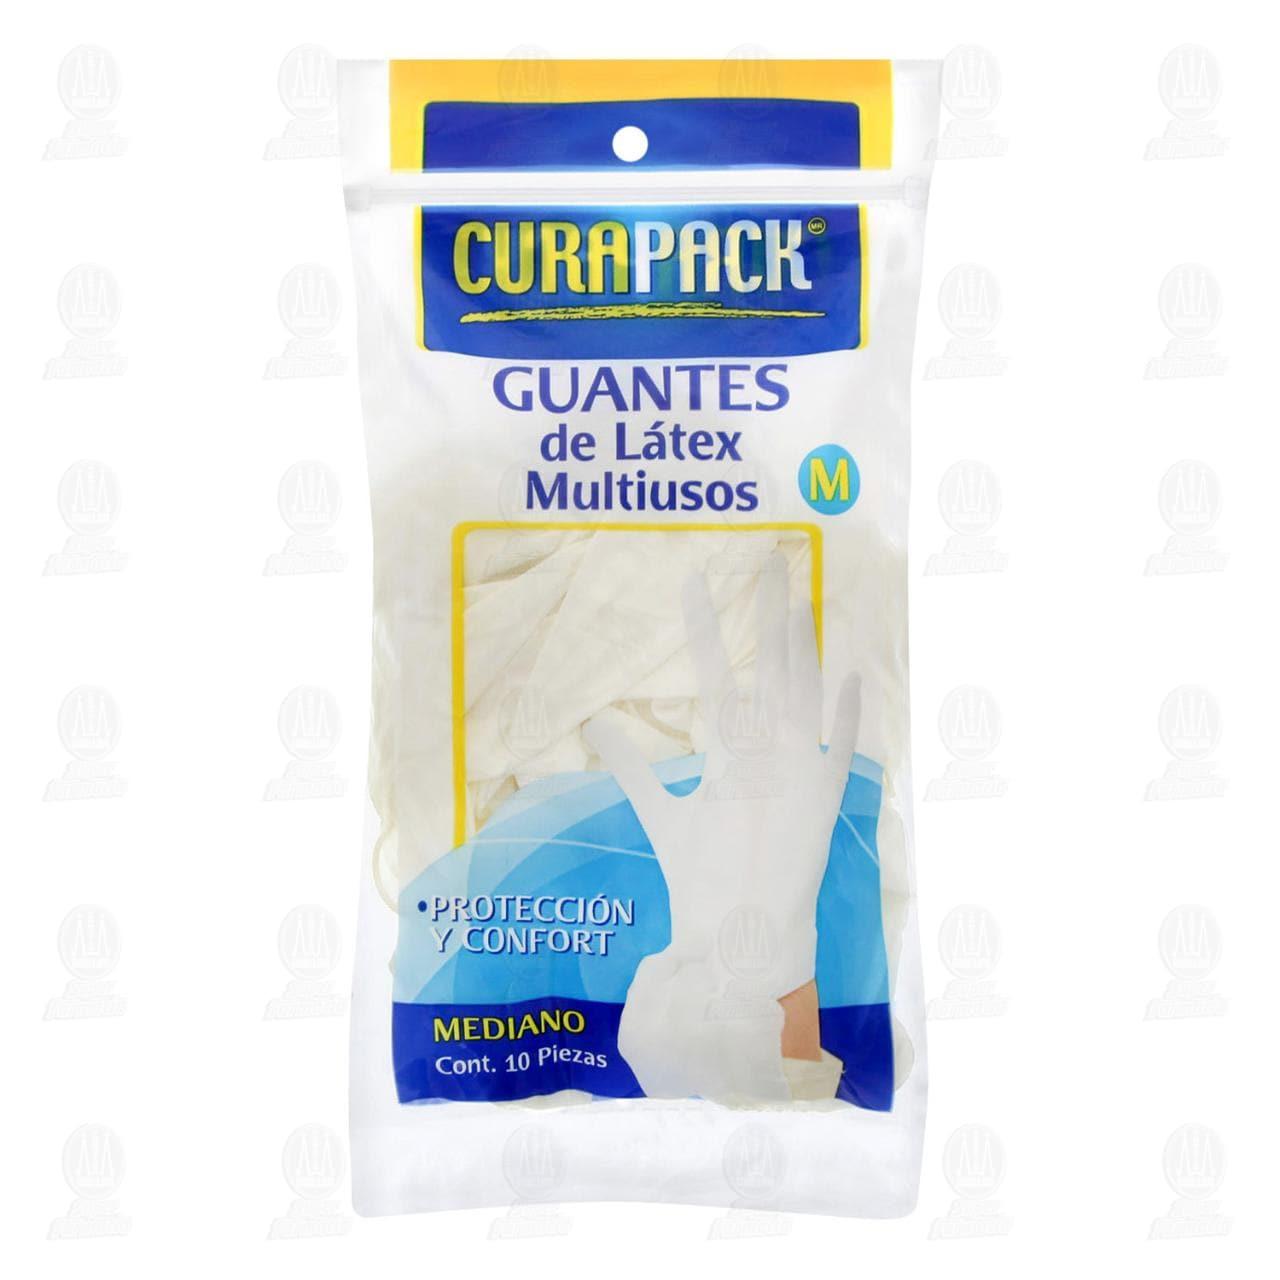 Guante Curapack Multiusos Mediano 10 pzas.